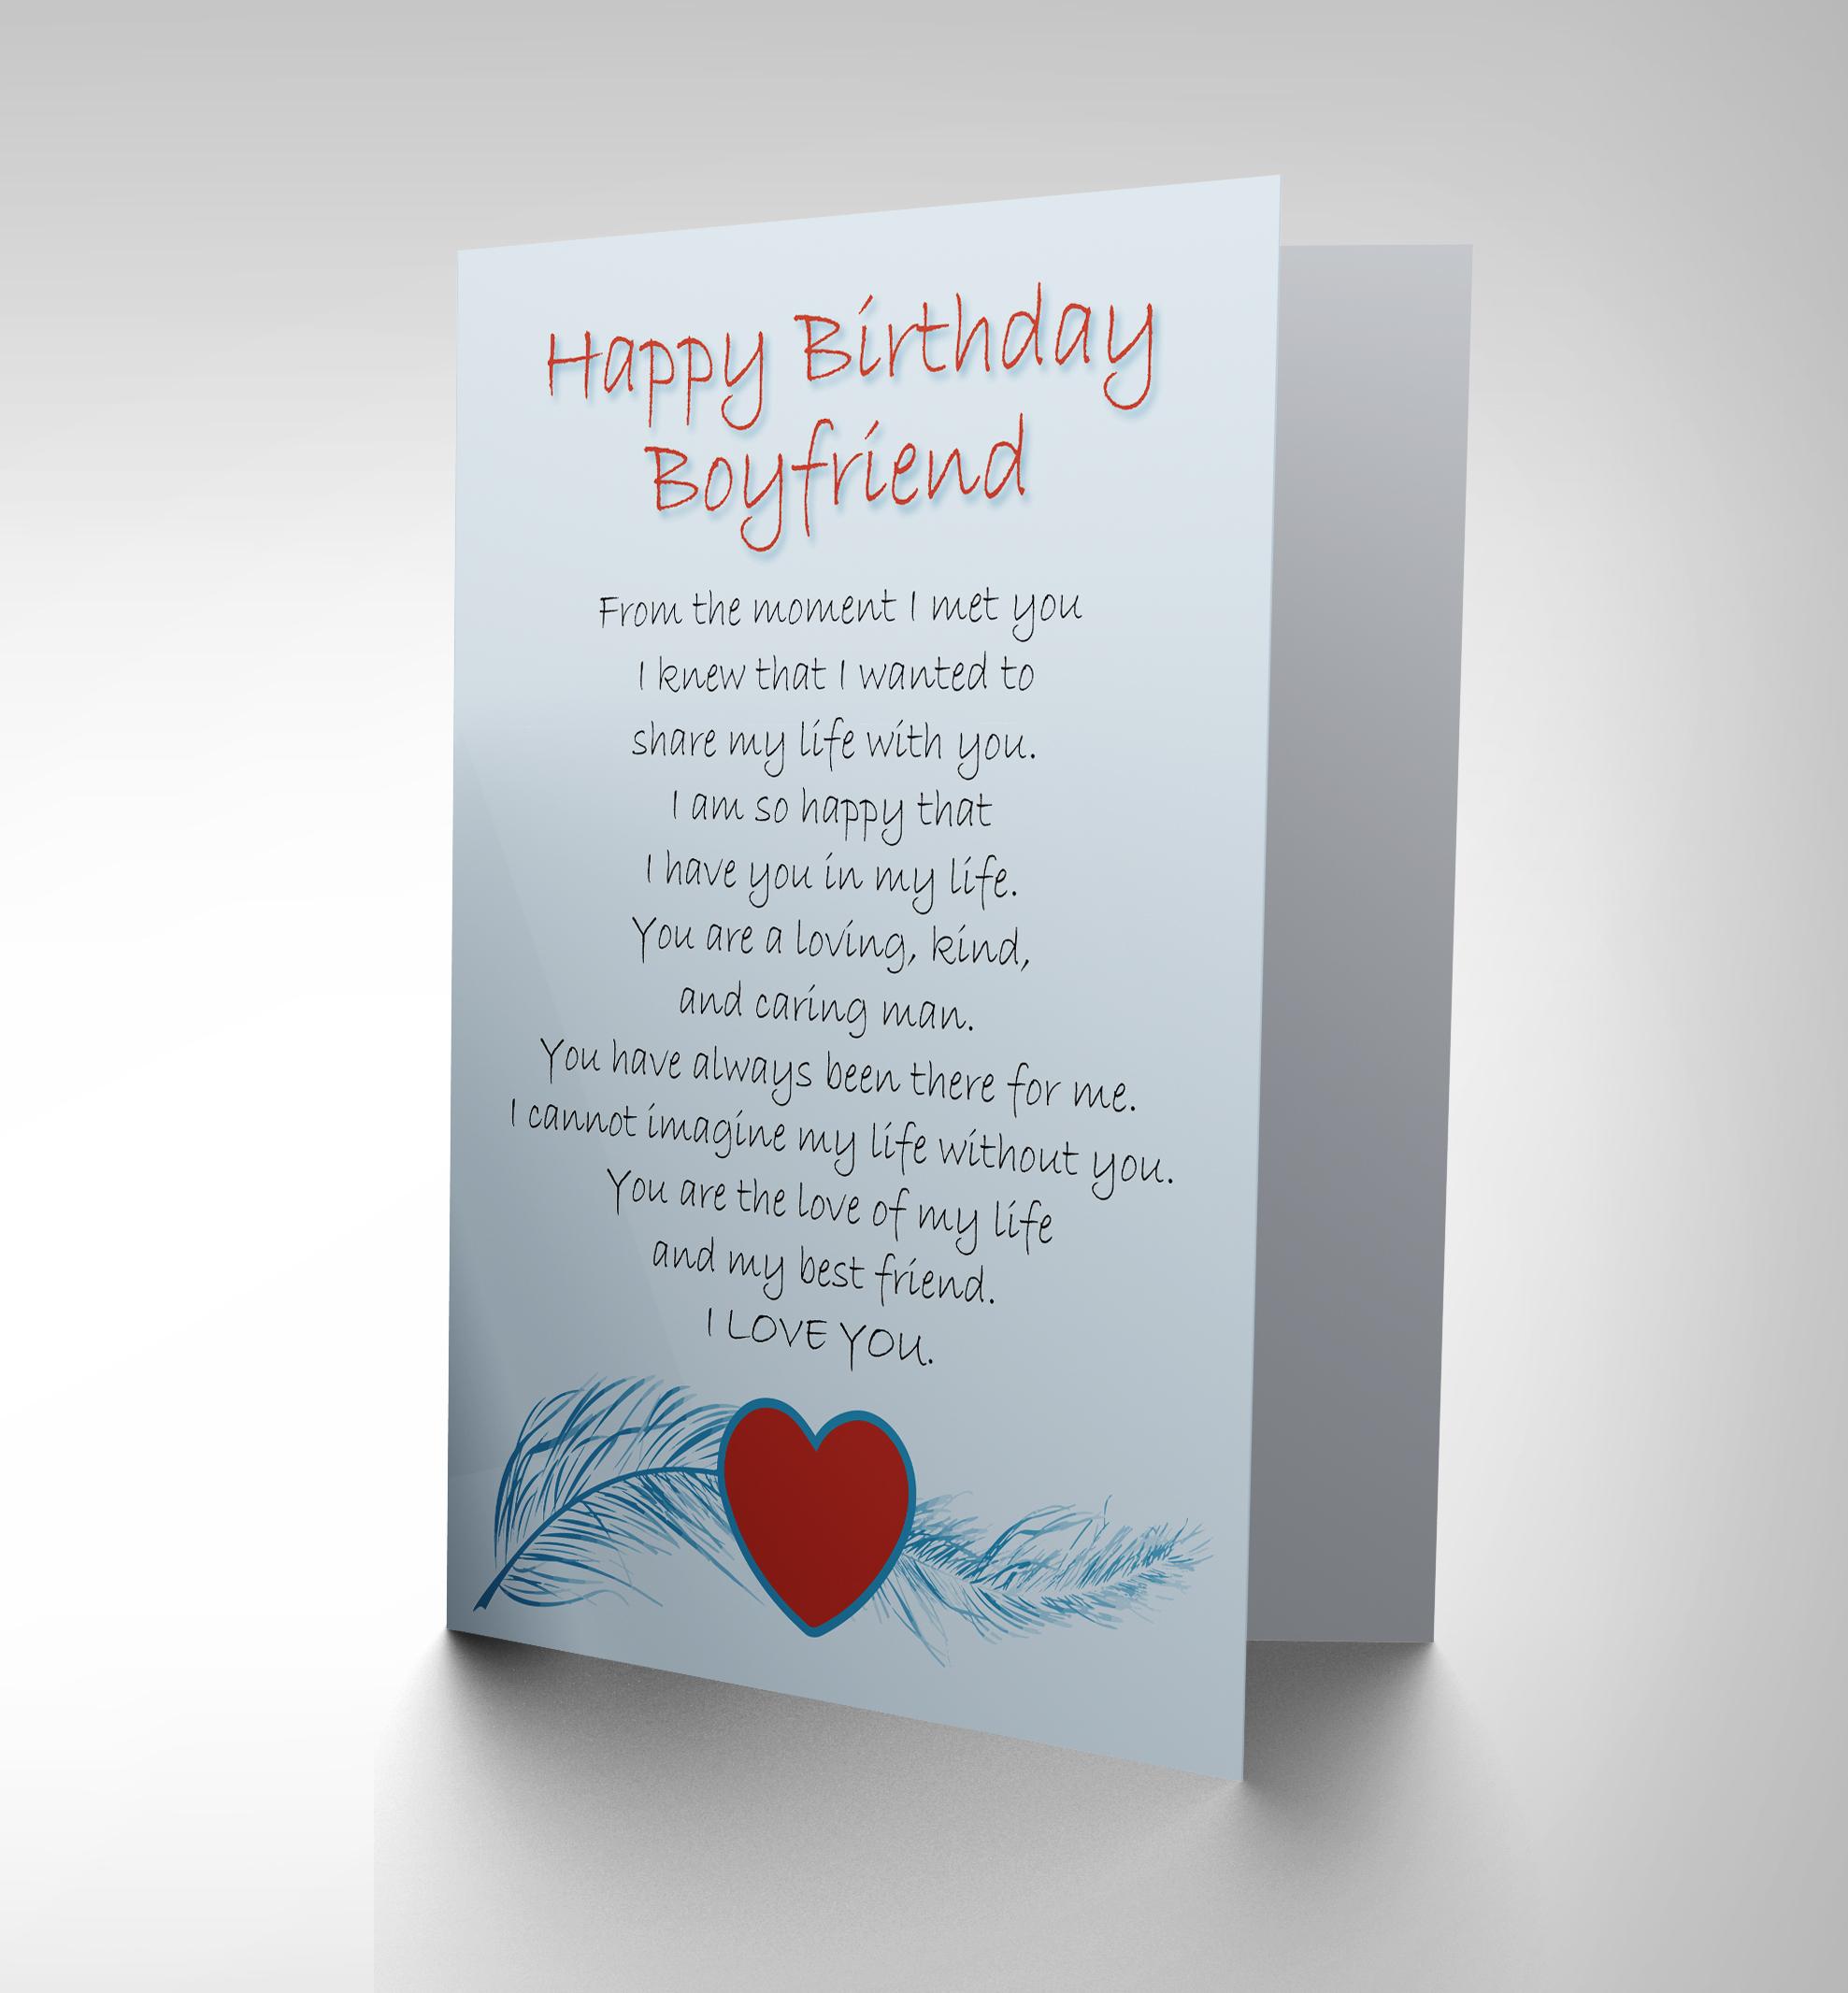 BIRTHDAY BOYFRIEND LOVE POEM NEW ART GREETINGS GIFT CARD